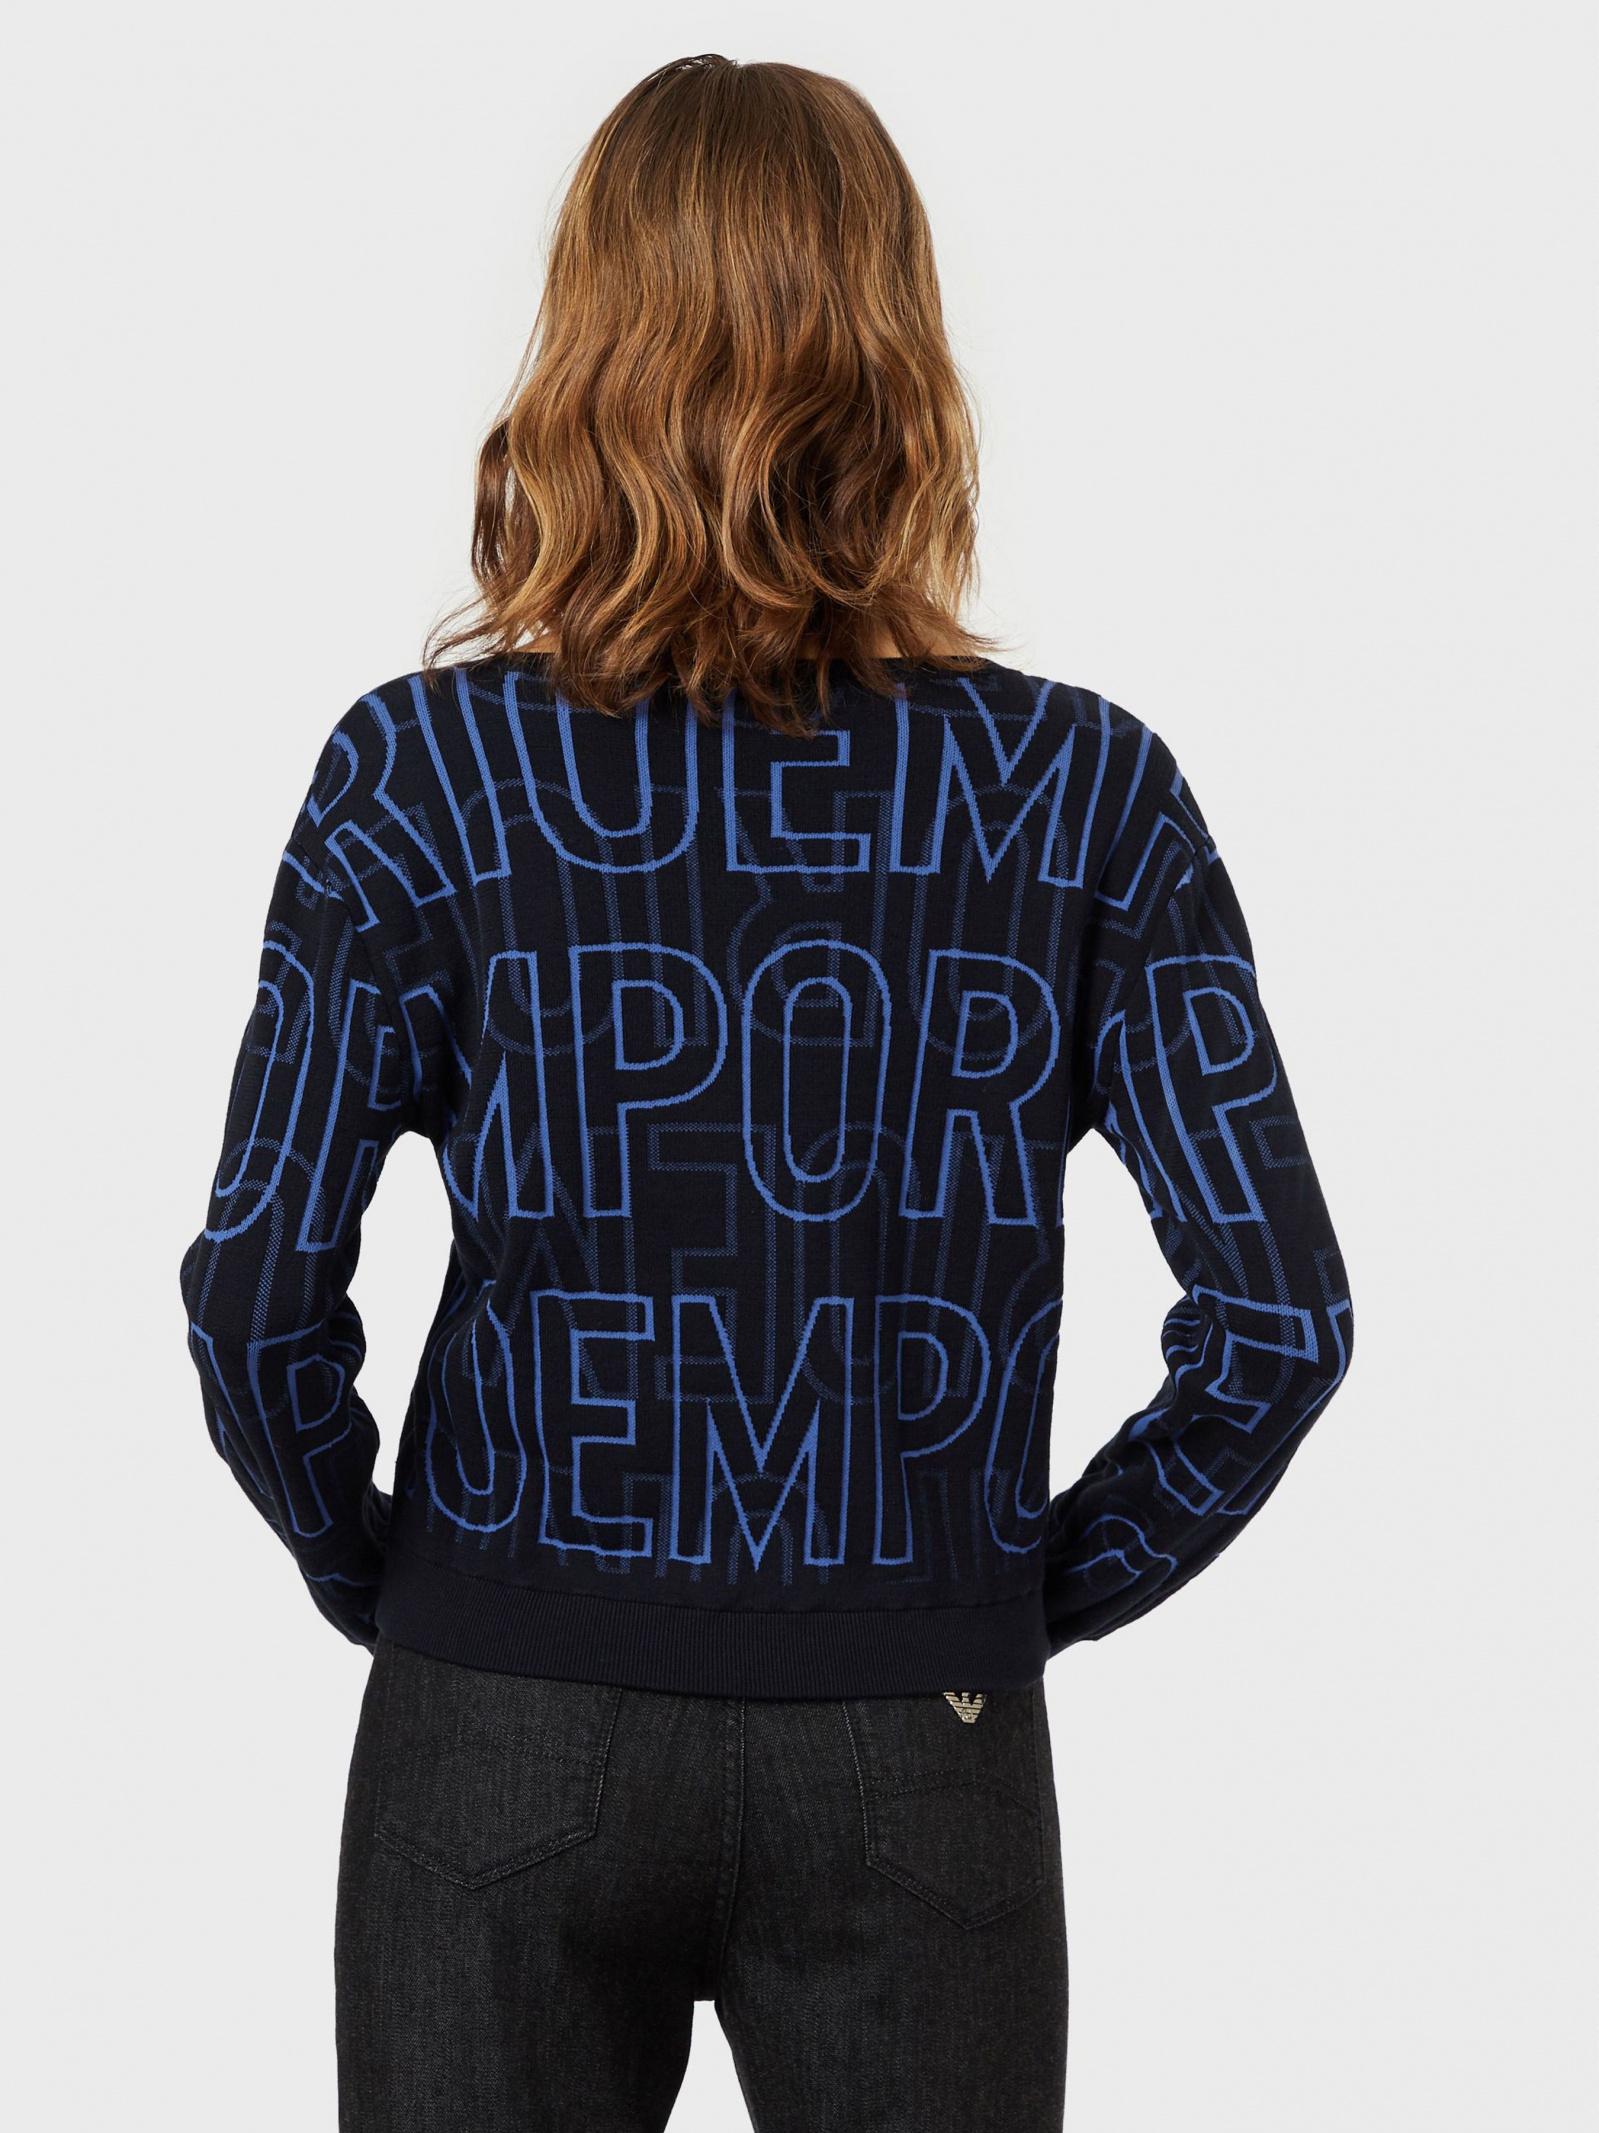 Кофты и свитера женские Emporio Armani модель 5P781 приобрести, 2017